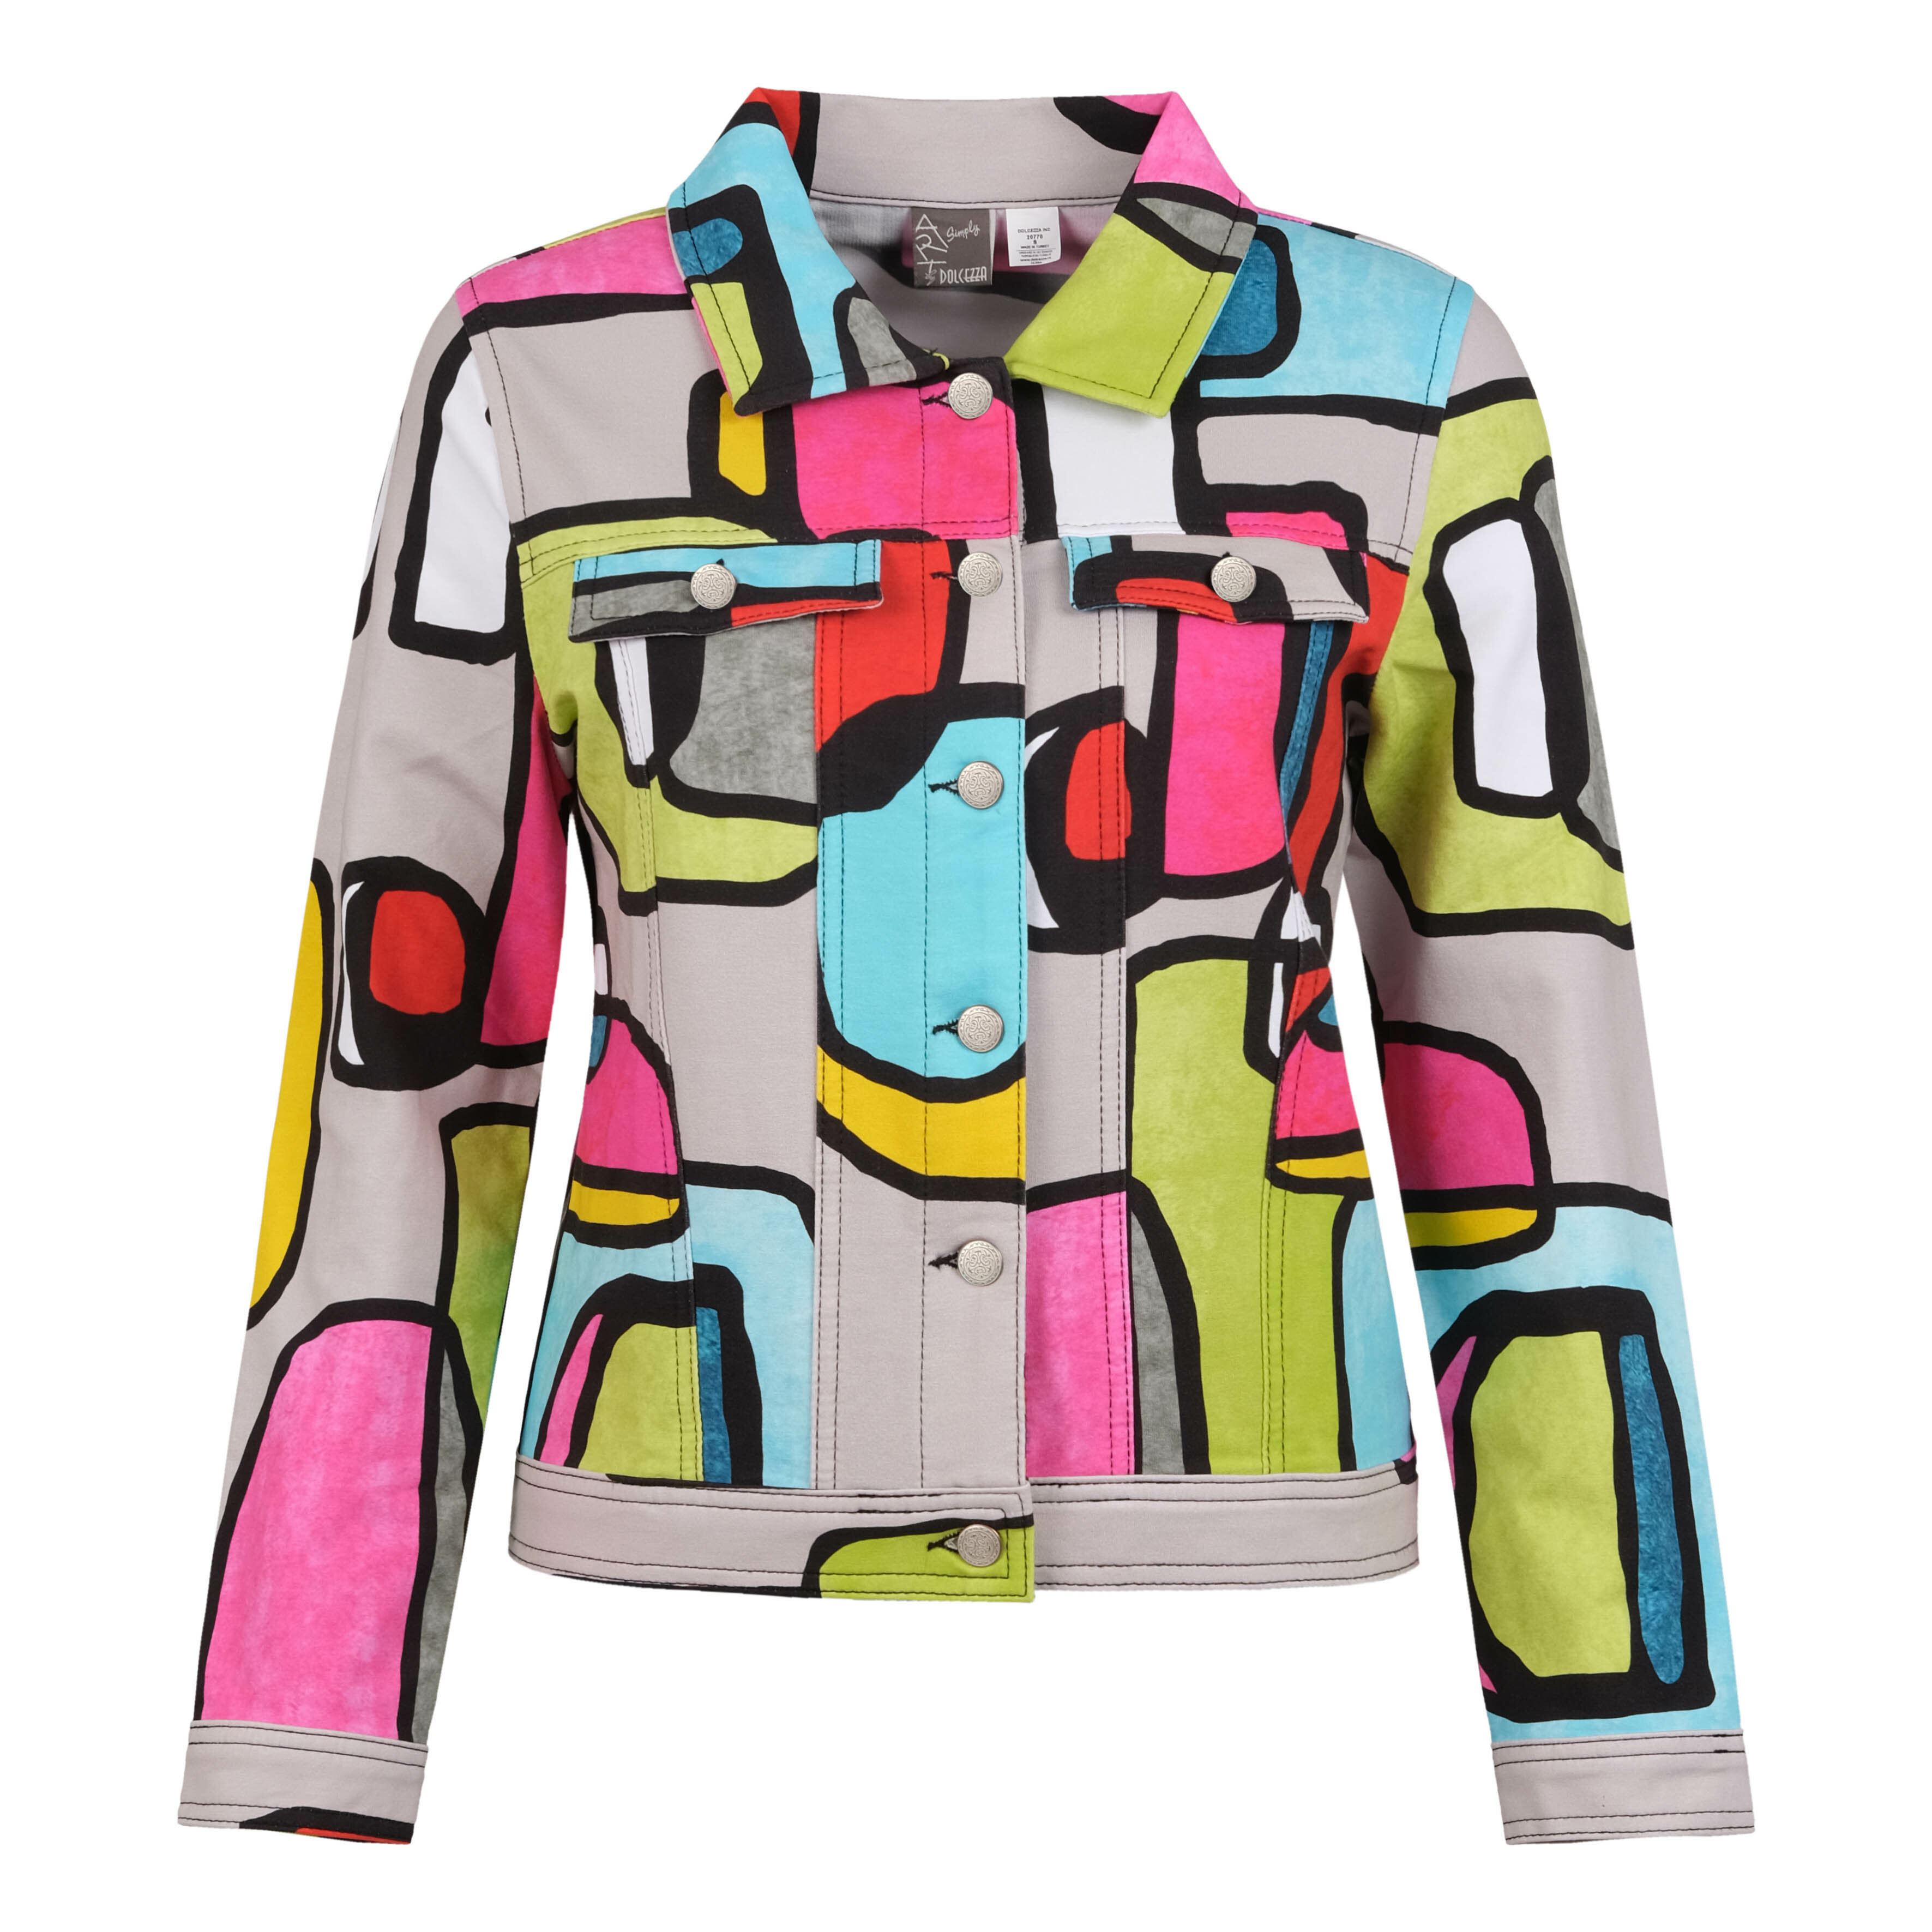 Simply Art Dolcezza: Mid Century Vibrant Romance Abstract Art Soft Denim Jacket (Few Left!) Dolcezza_SimplyArt_20770_N